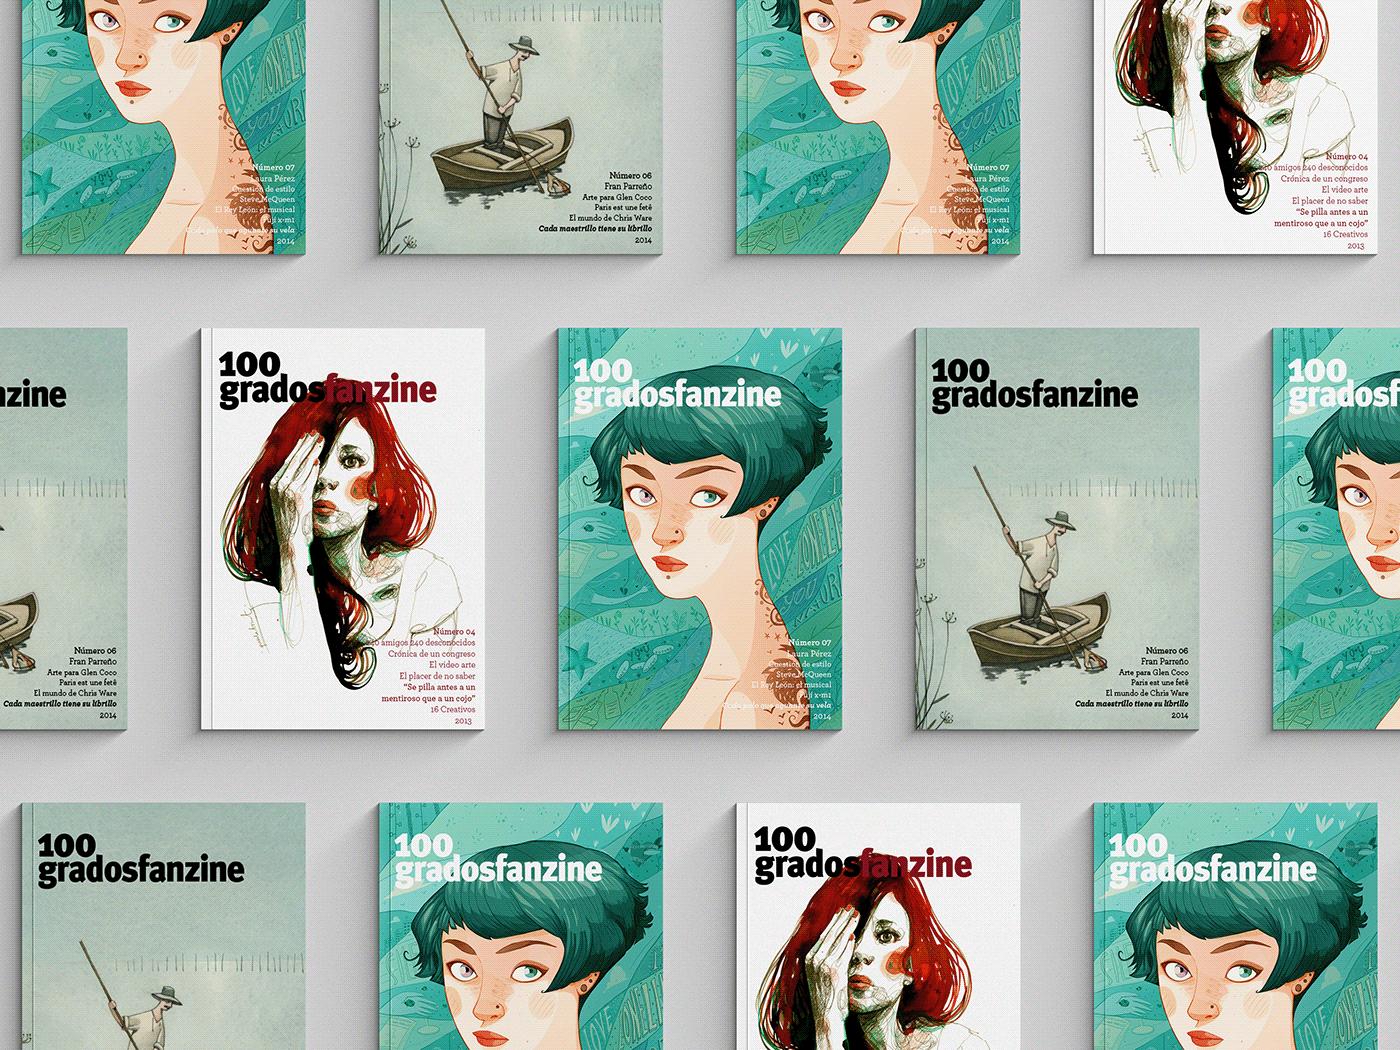 art direction  brand editorial editorial design  fanzine ILLUSTRATION  magazine